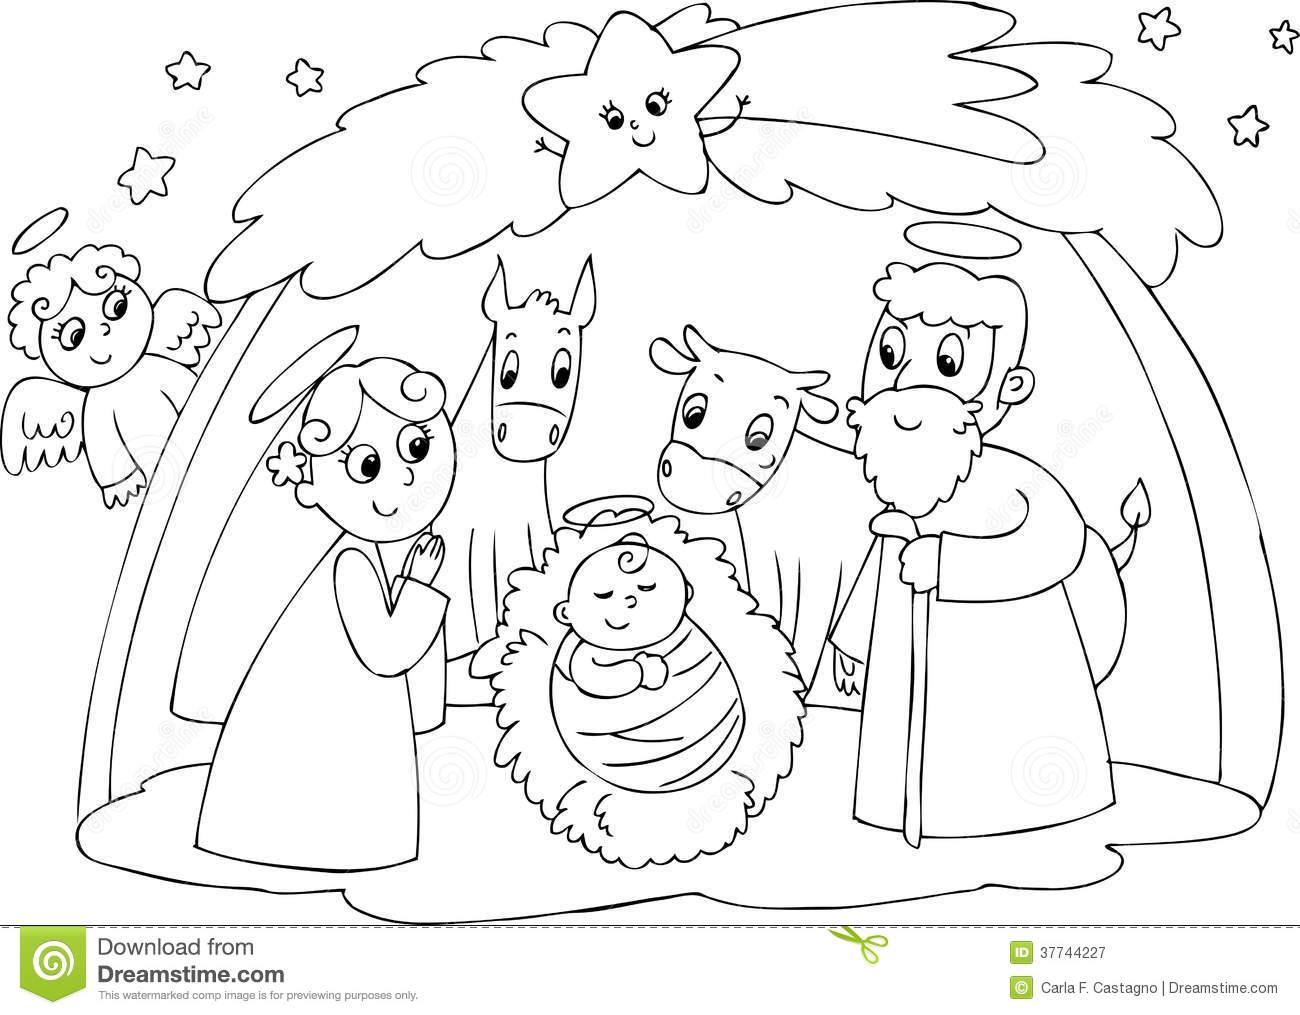 Clipart black mary joseph and jesus photo jpg royalty free stock Nativity: Mary Joseph And Jesus Royalty Free Stock Photography ... jpg royalty free stock